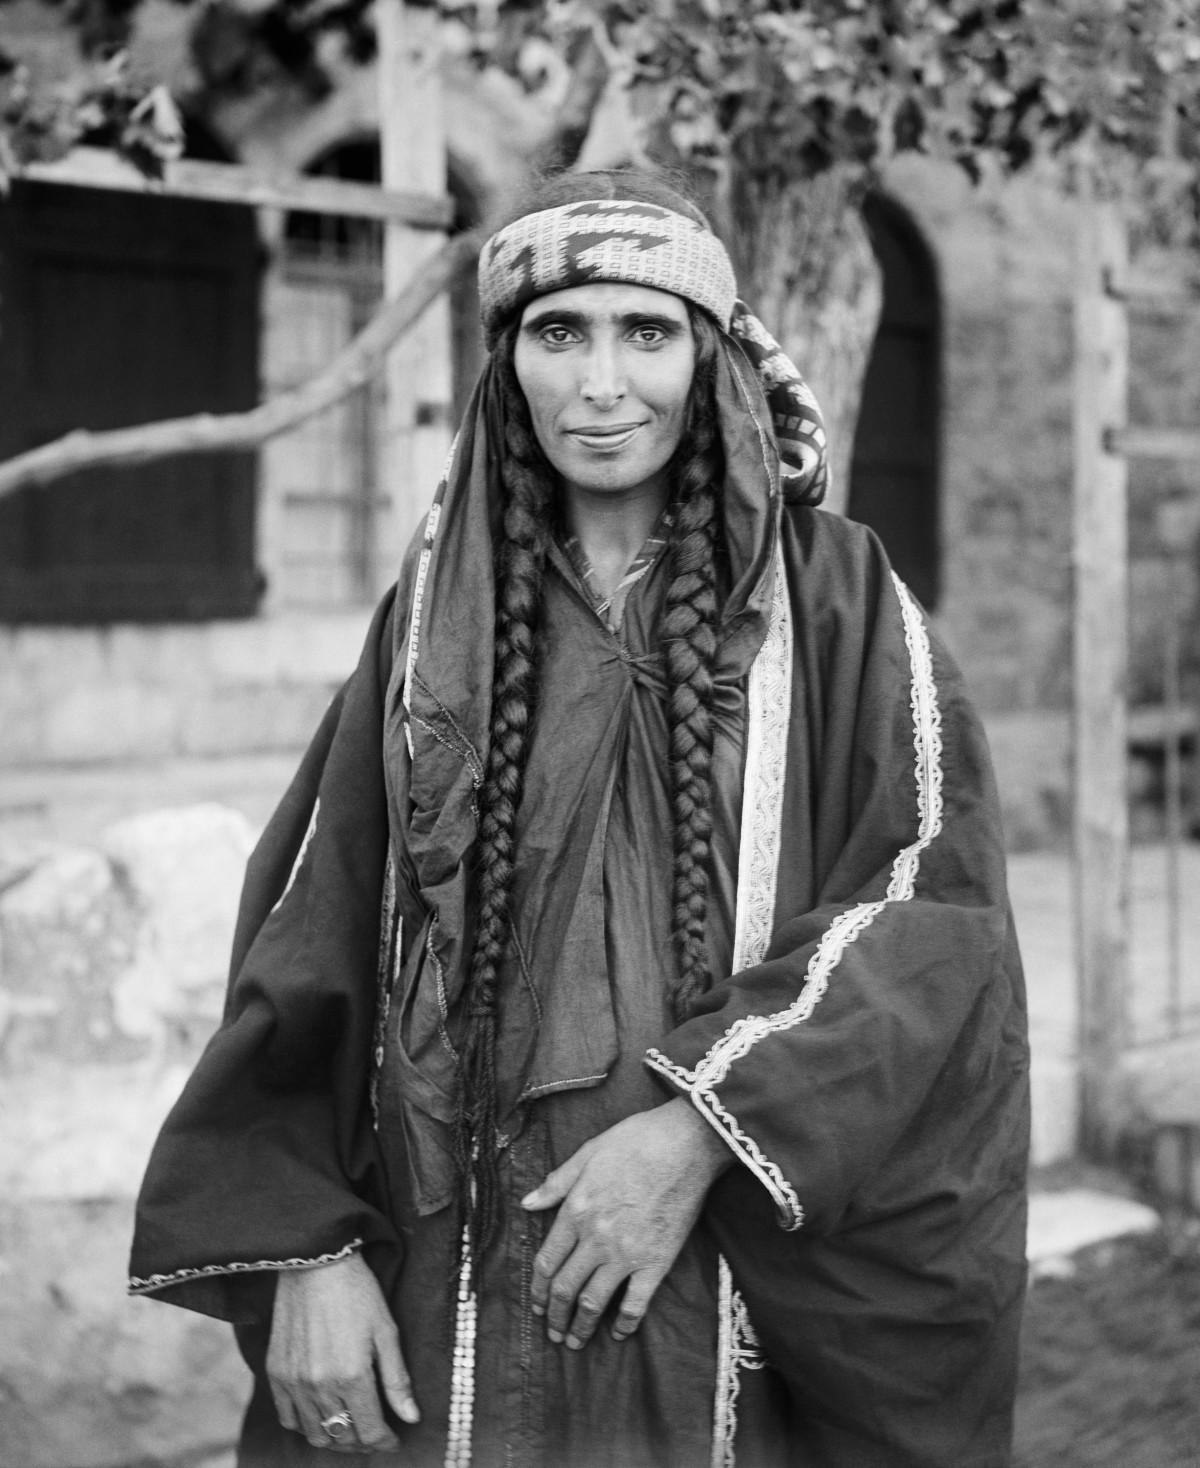 Bedouinwomanb